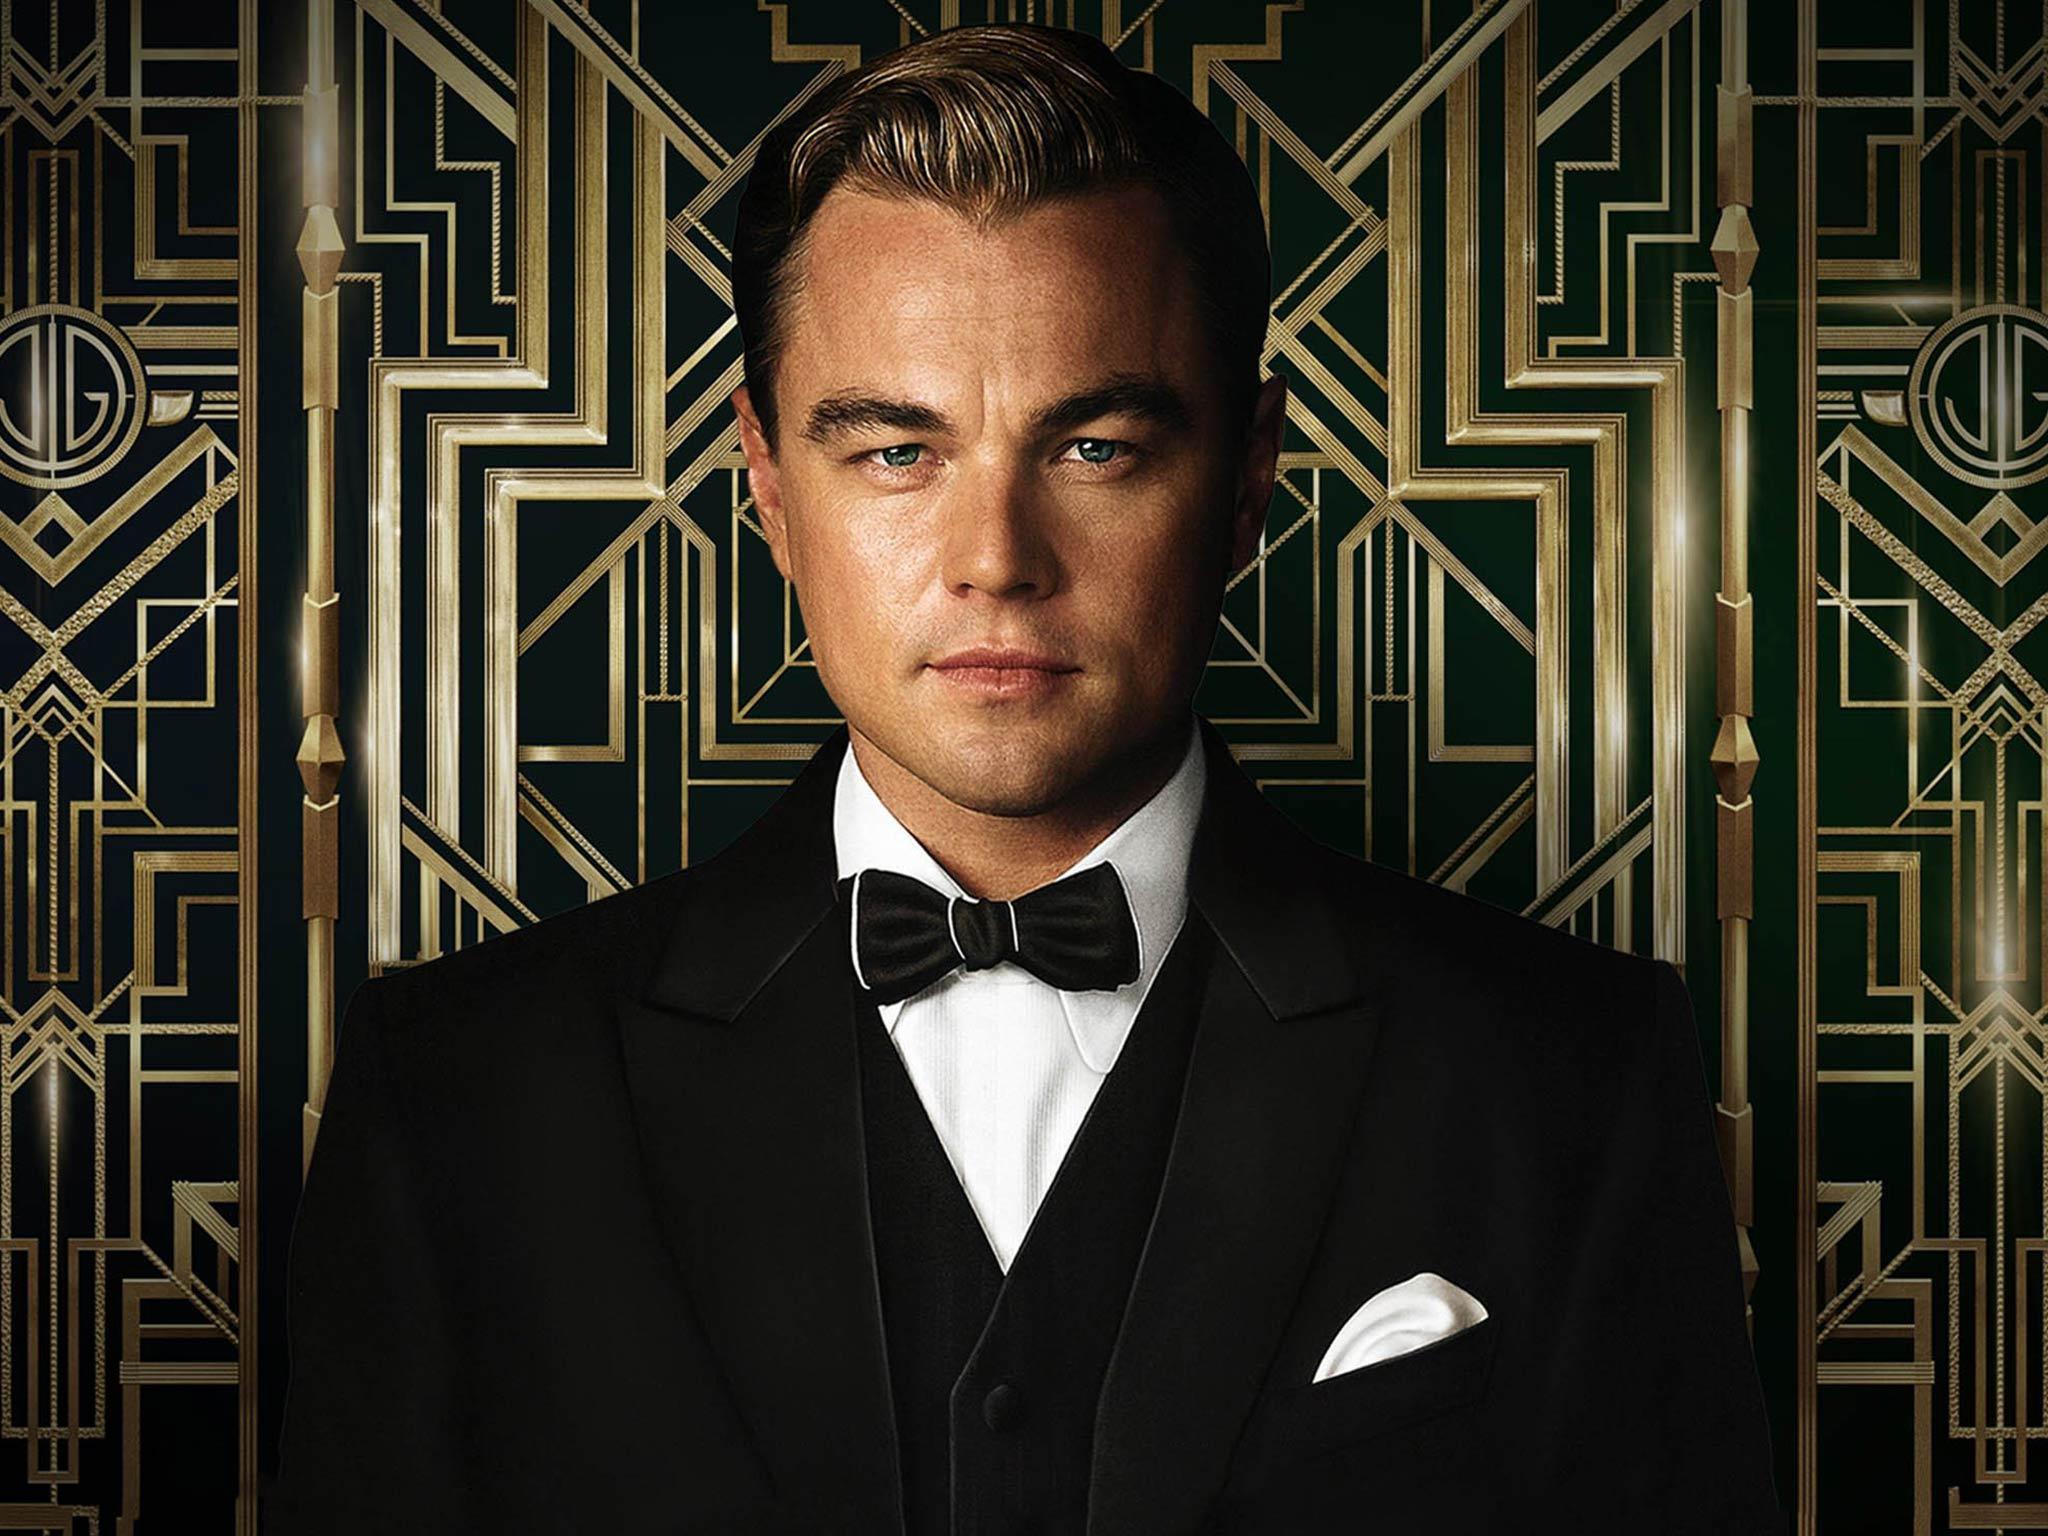 The Great Gatsby | TBS.com